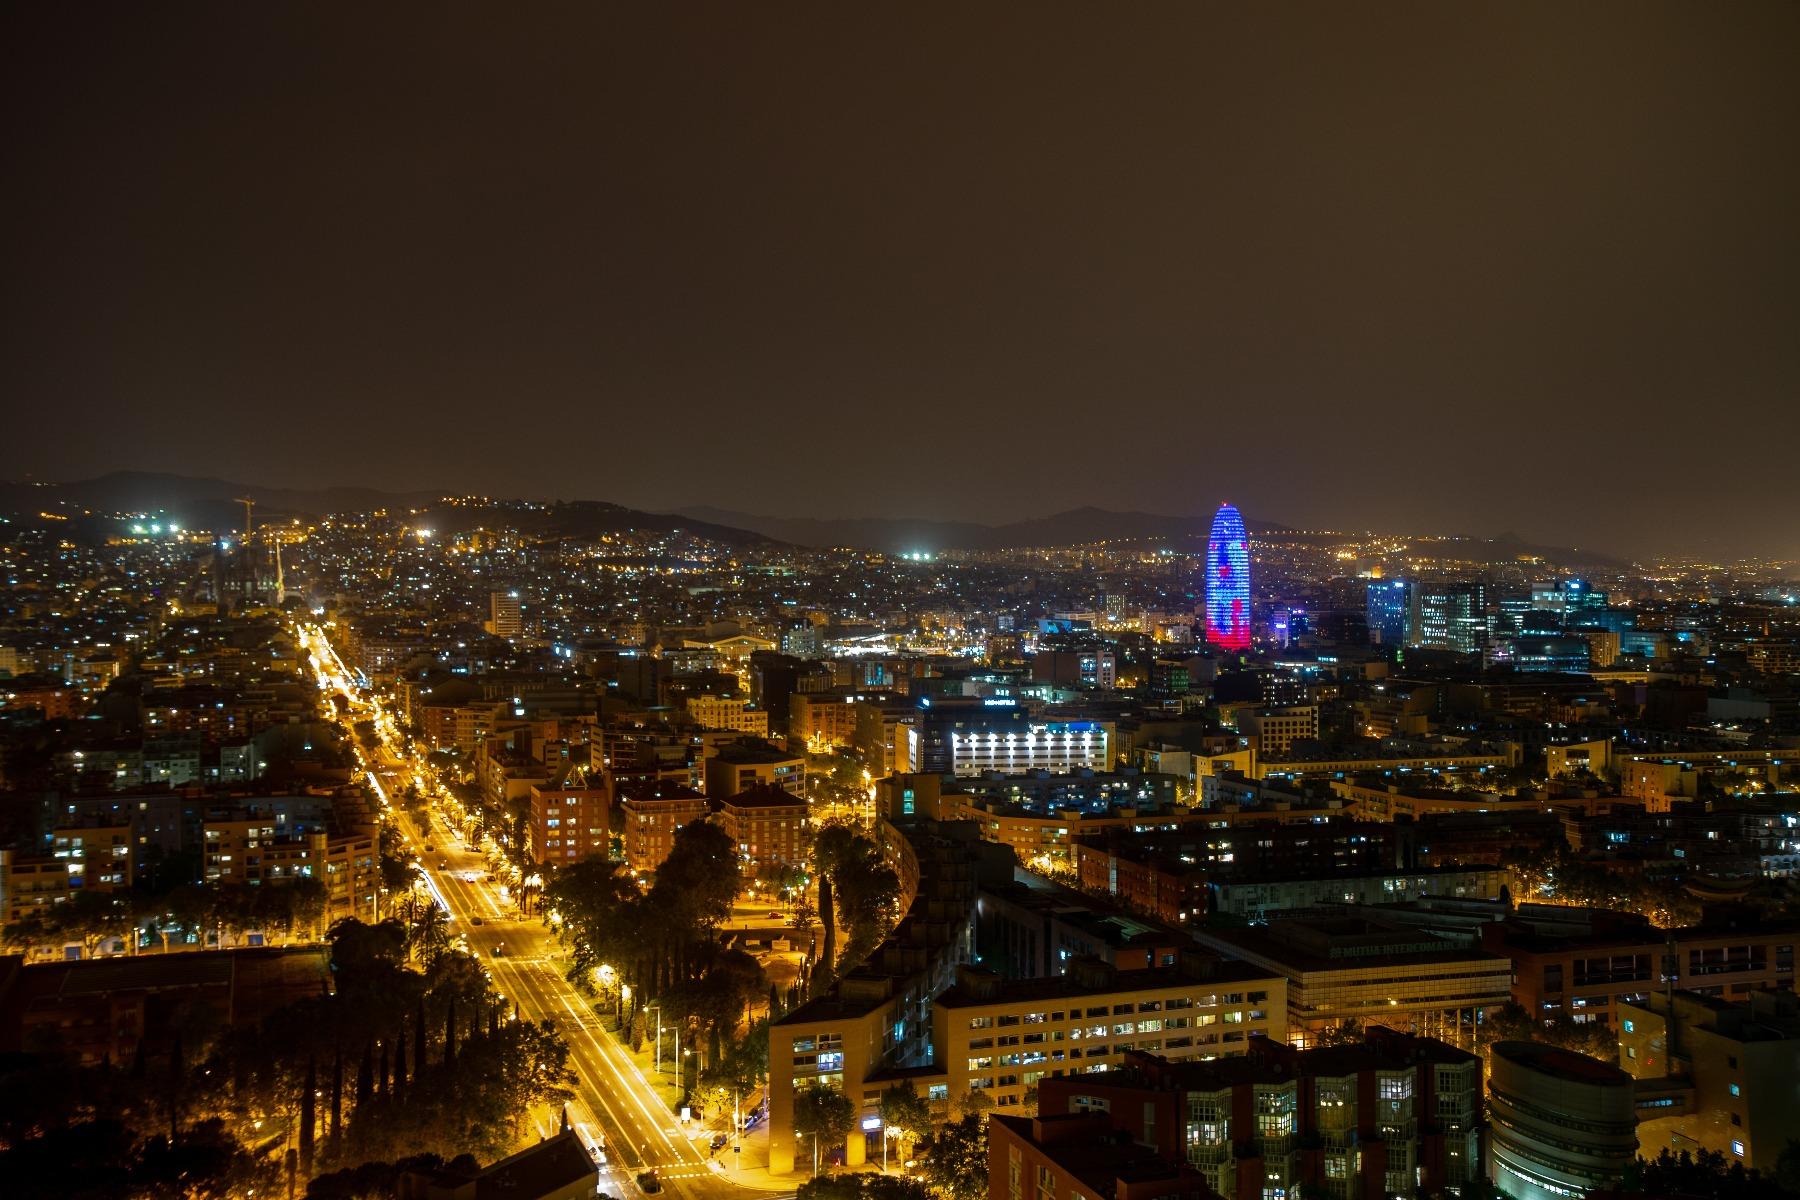 barcelona emobility by night